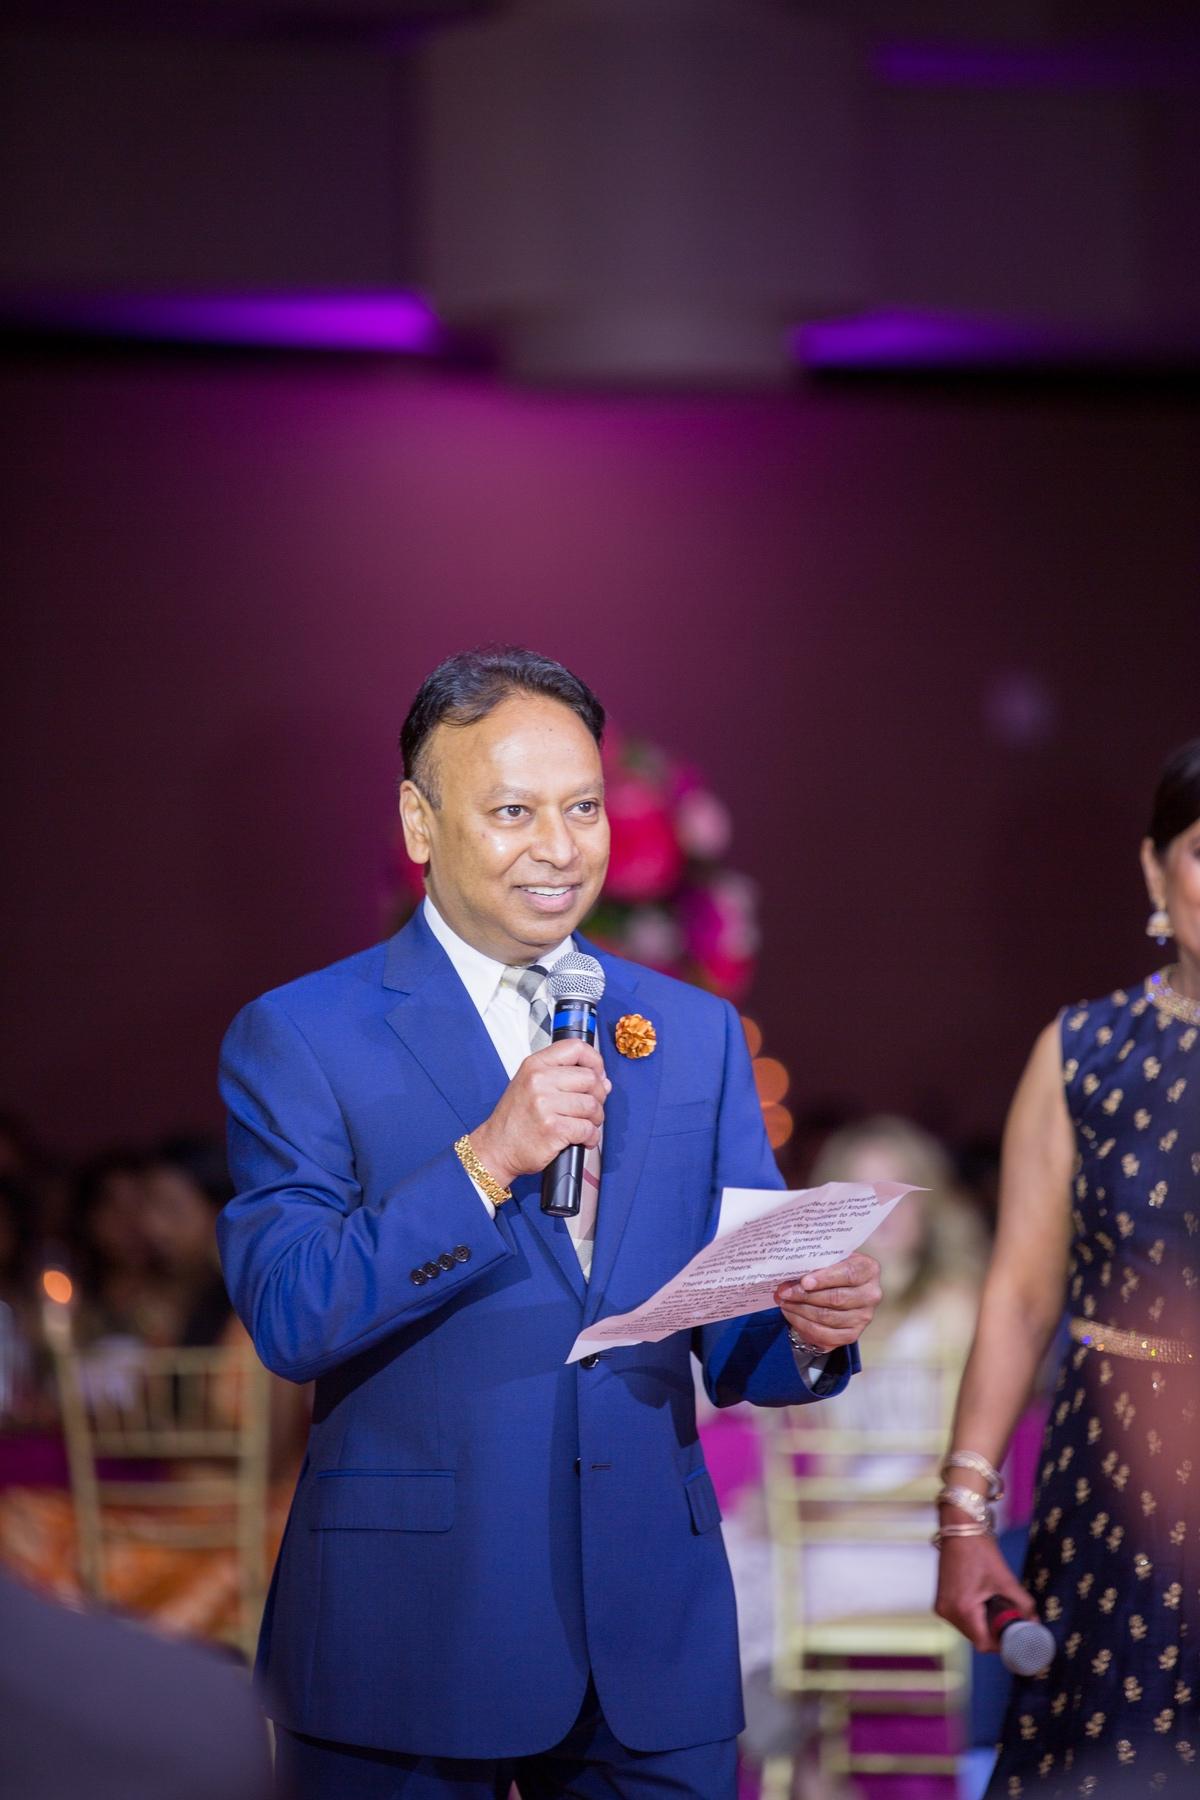 Le Cape Weddings - South Asian Wedding - Chicago Wedding Photographer P&V-70-2.jpg